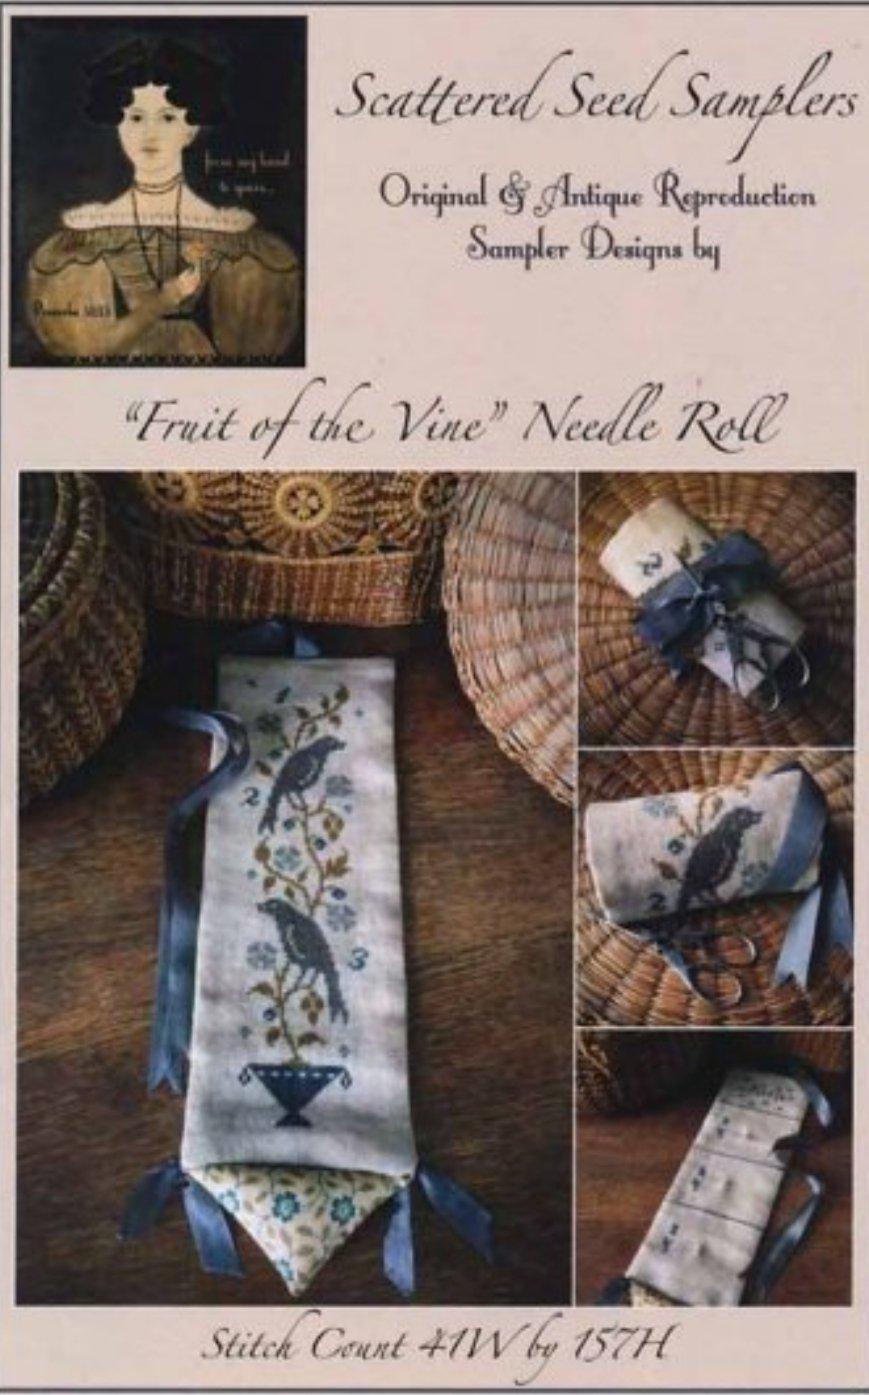 Scattered Seeds Samplers - Fruit of the Vine Needleroll